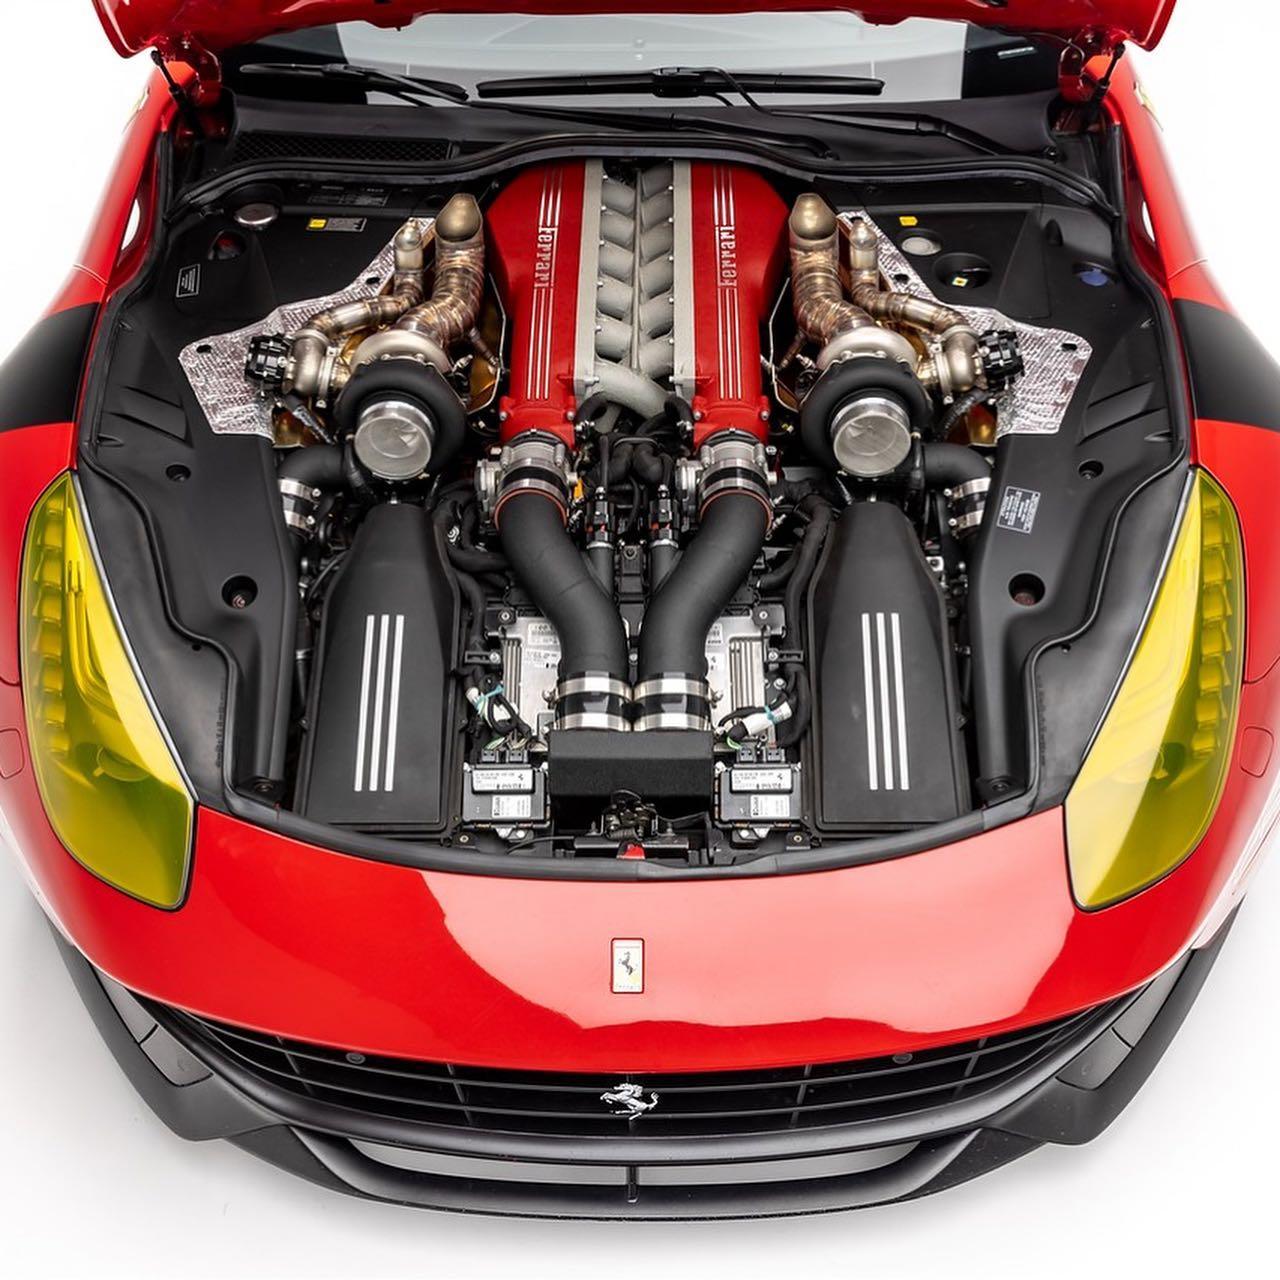 Twin-Turbo-Ferrari-F12-Berlinetta-by-Daily-Driven-Exotics-15